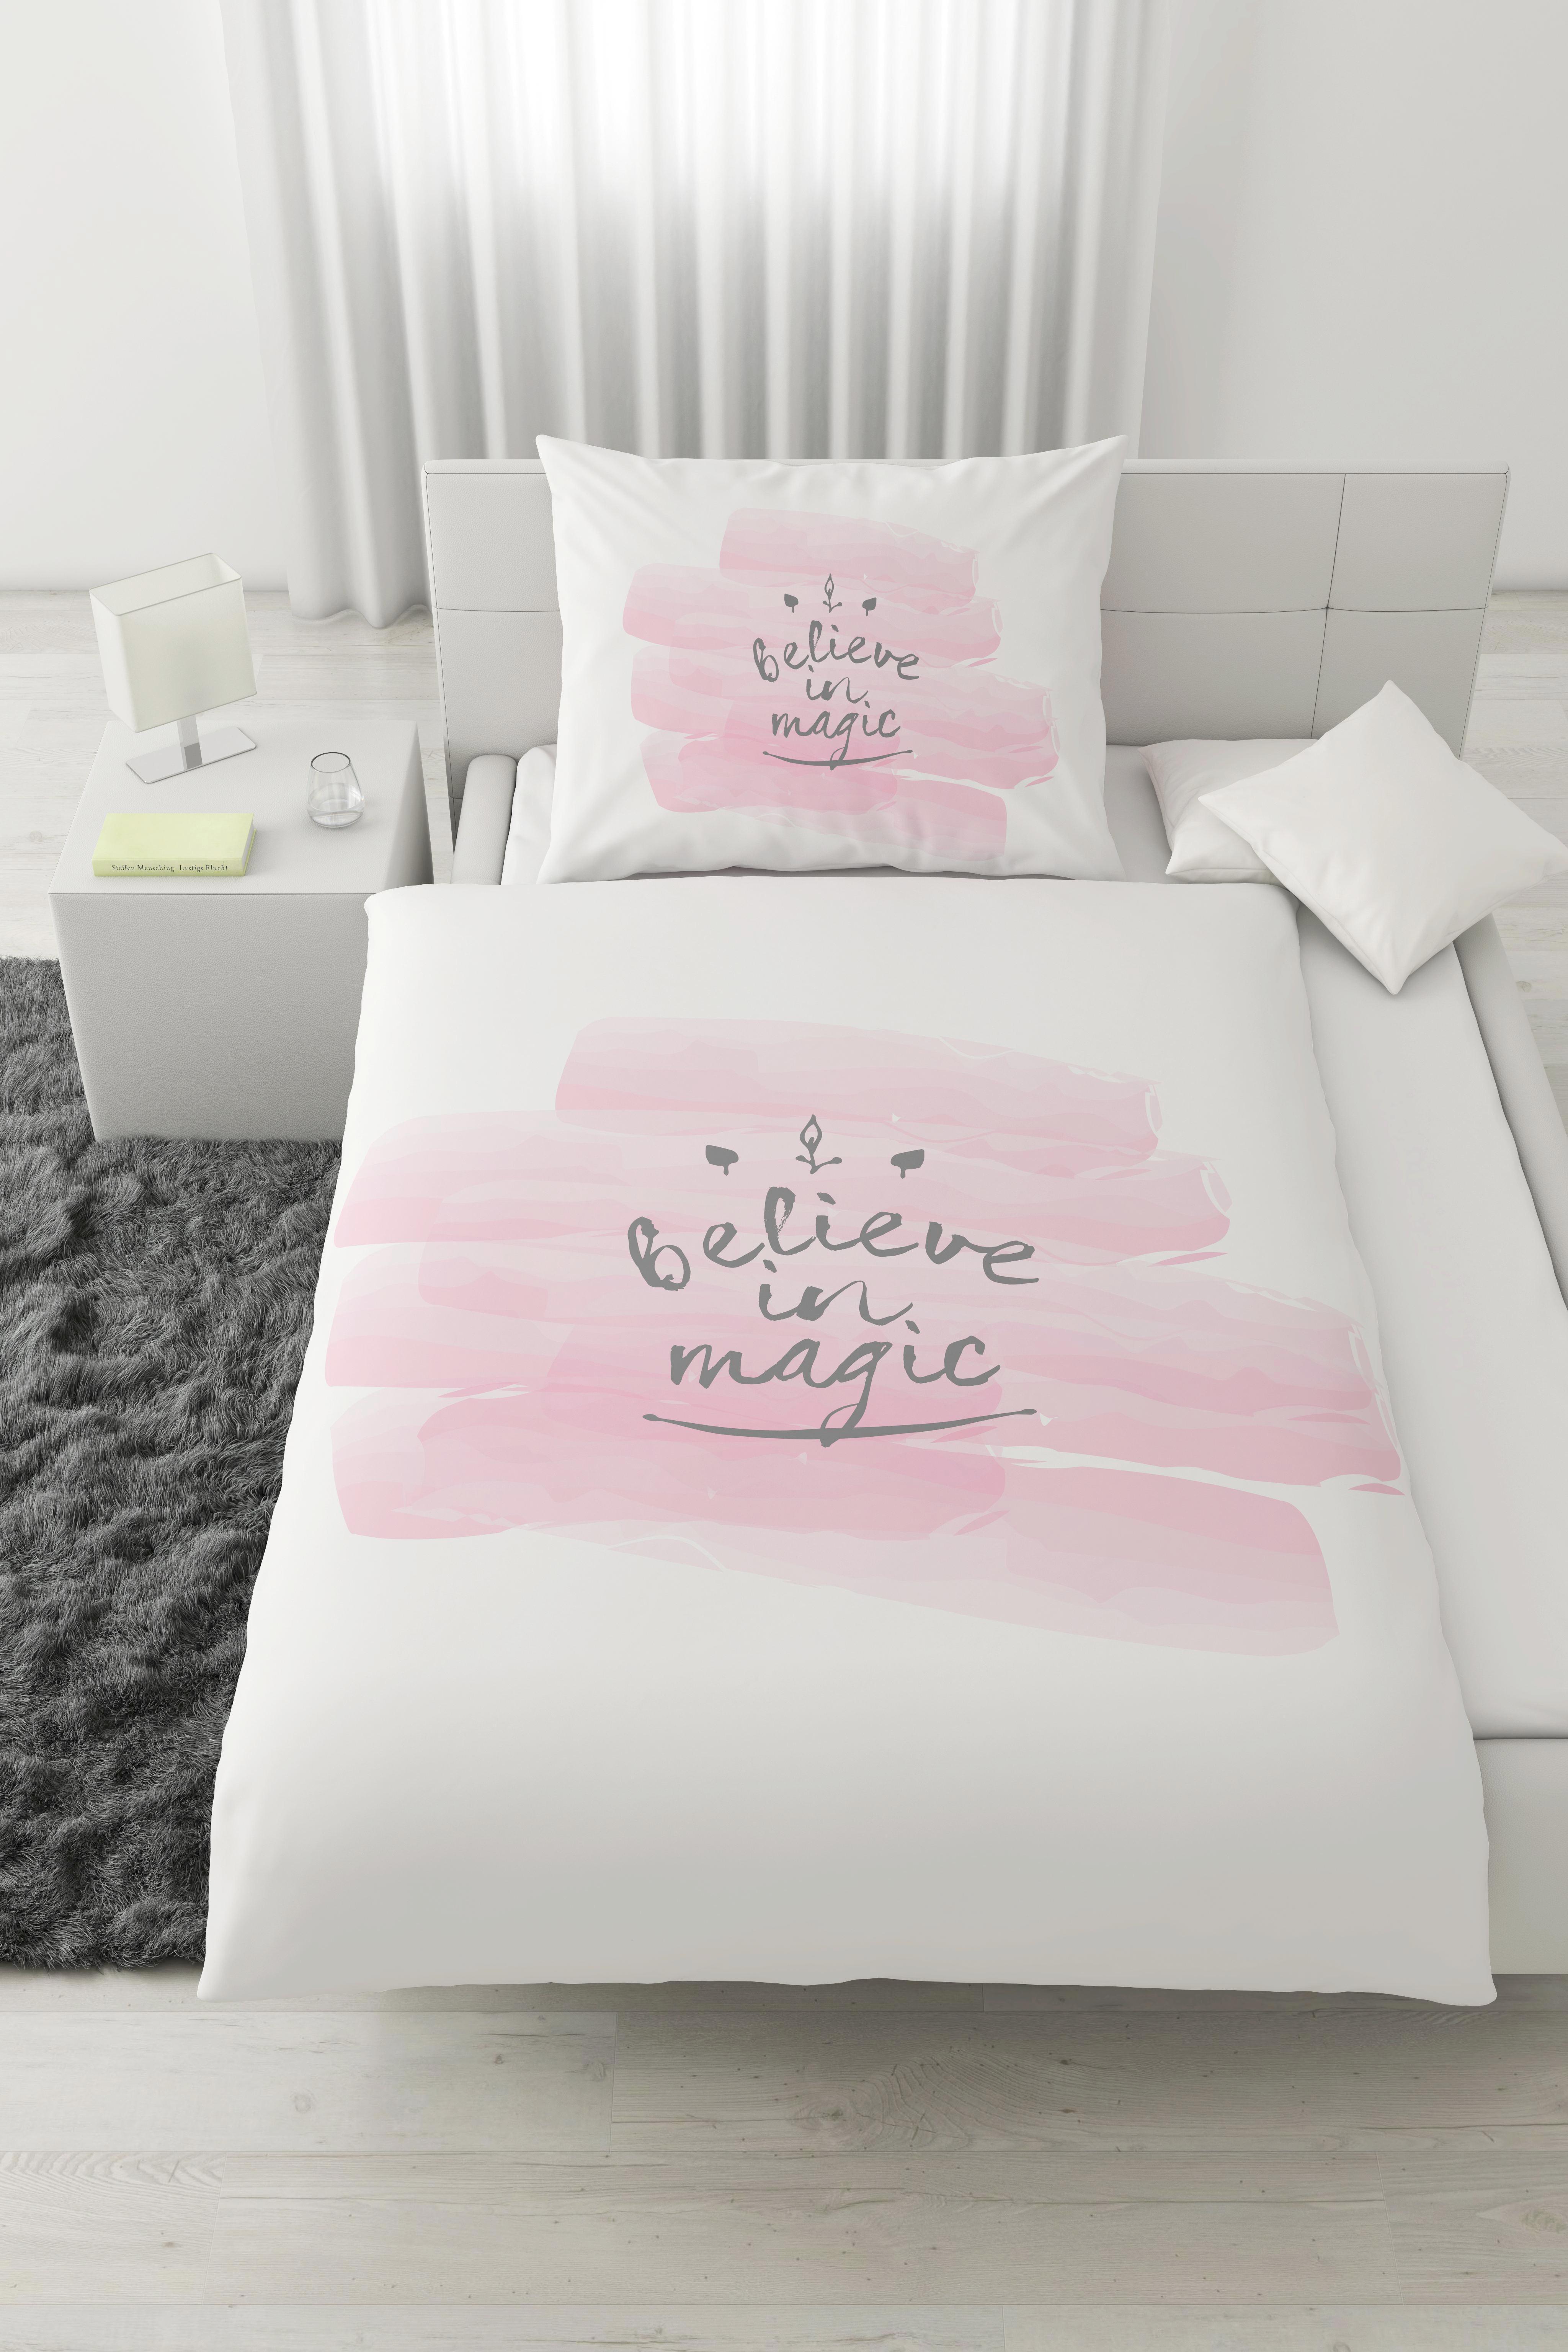 Bettwäsche Magic, ca. 140x200cm - Rosa/Weiß, ROMANTIK / LANDHAUS, Textil (140/200cm) - MÖMAX modern living